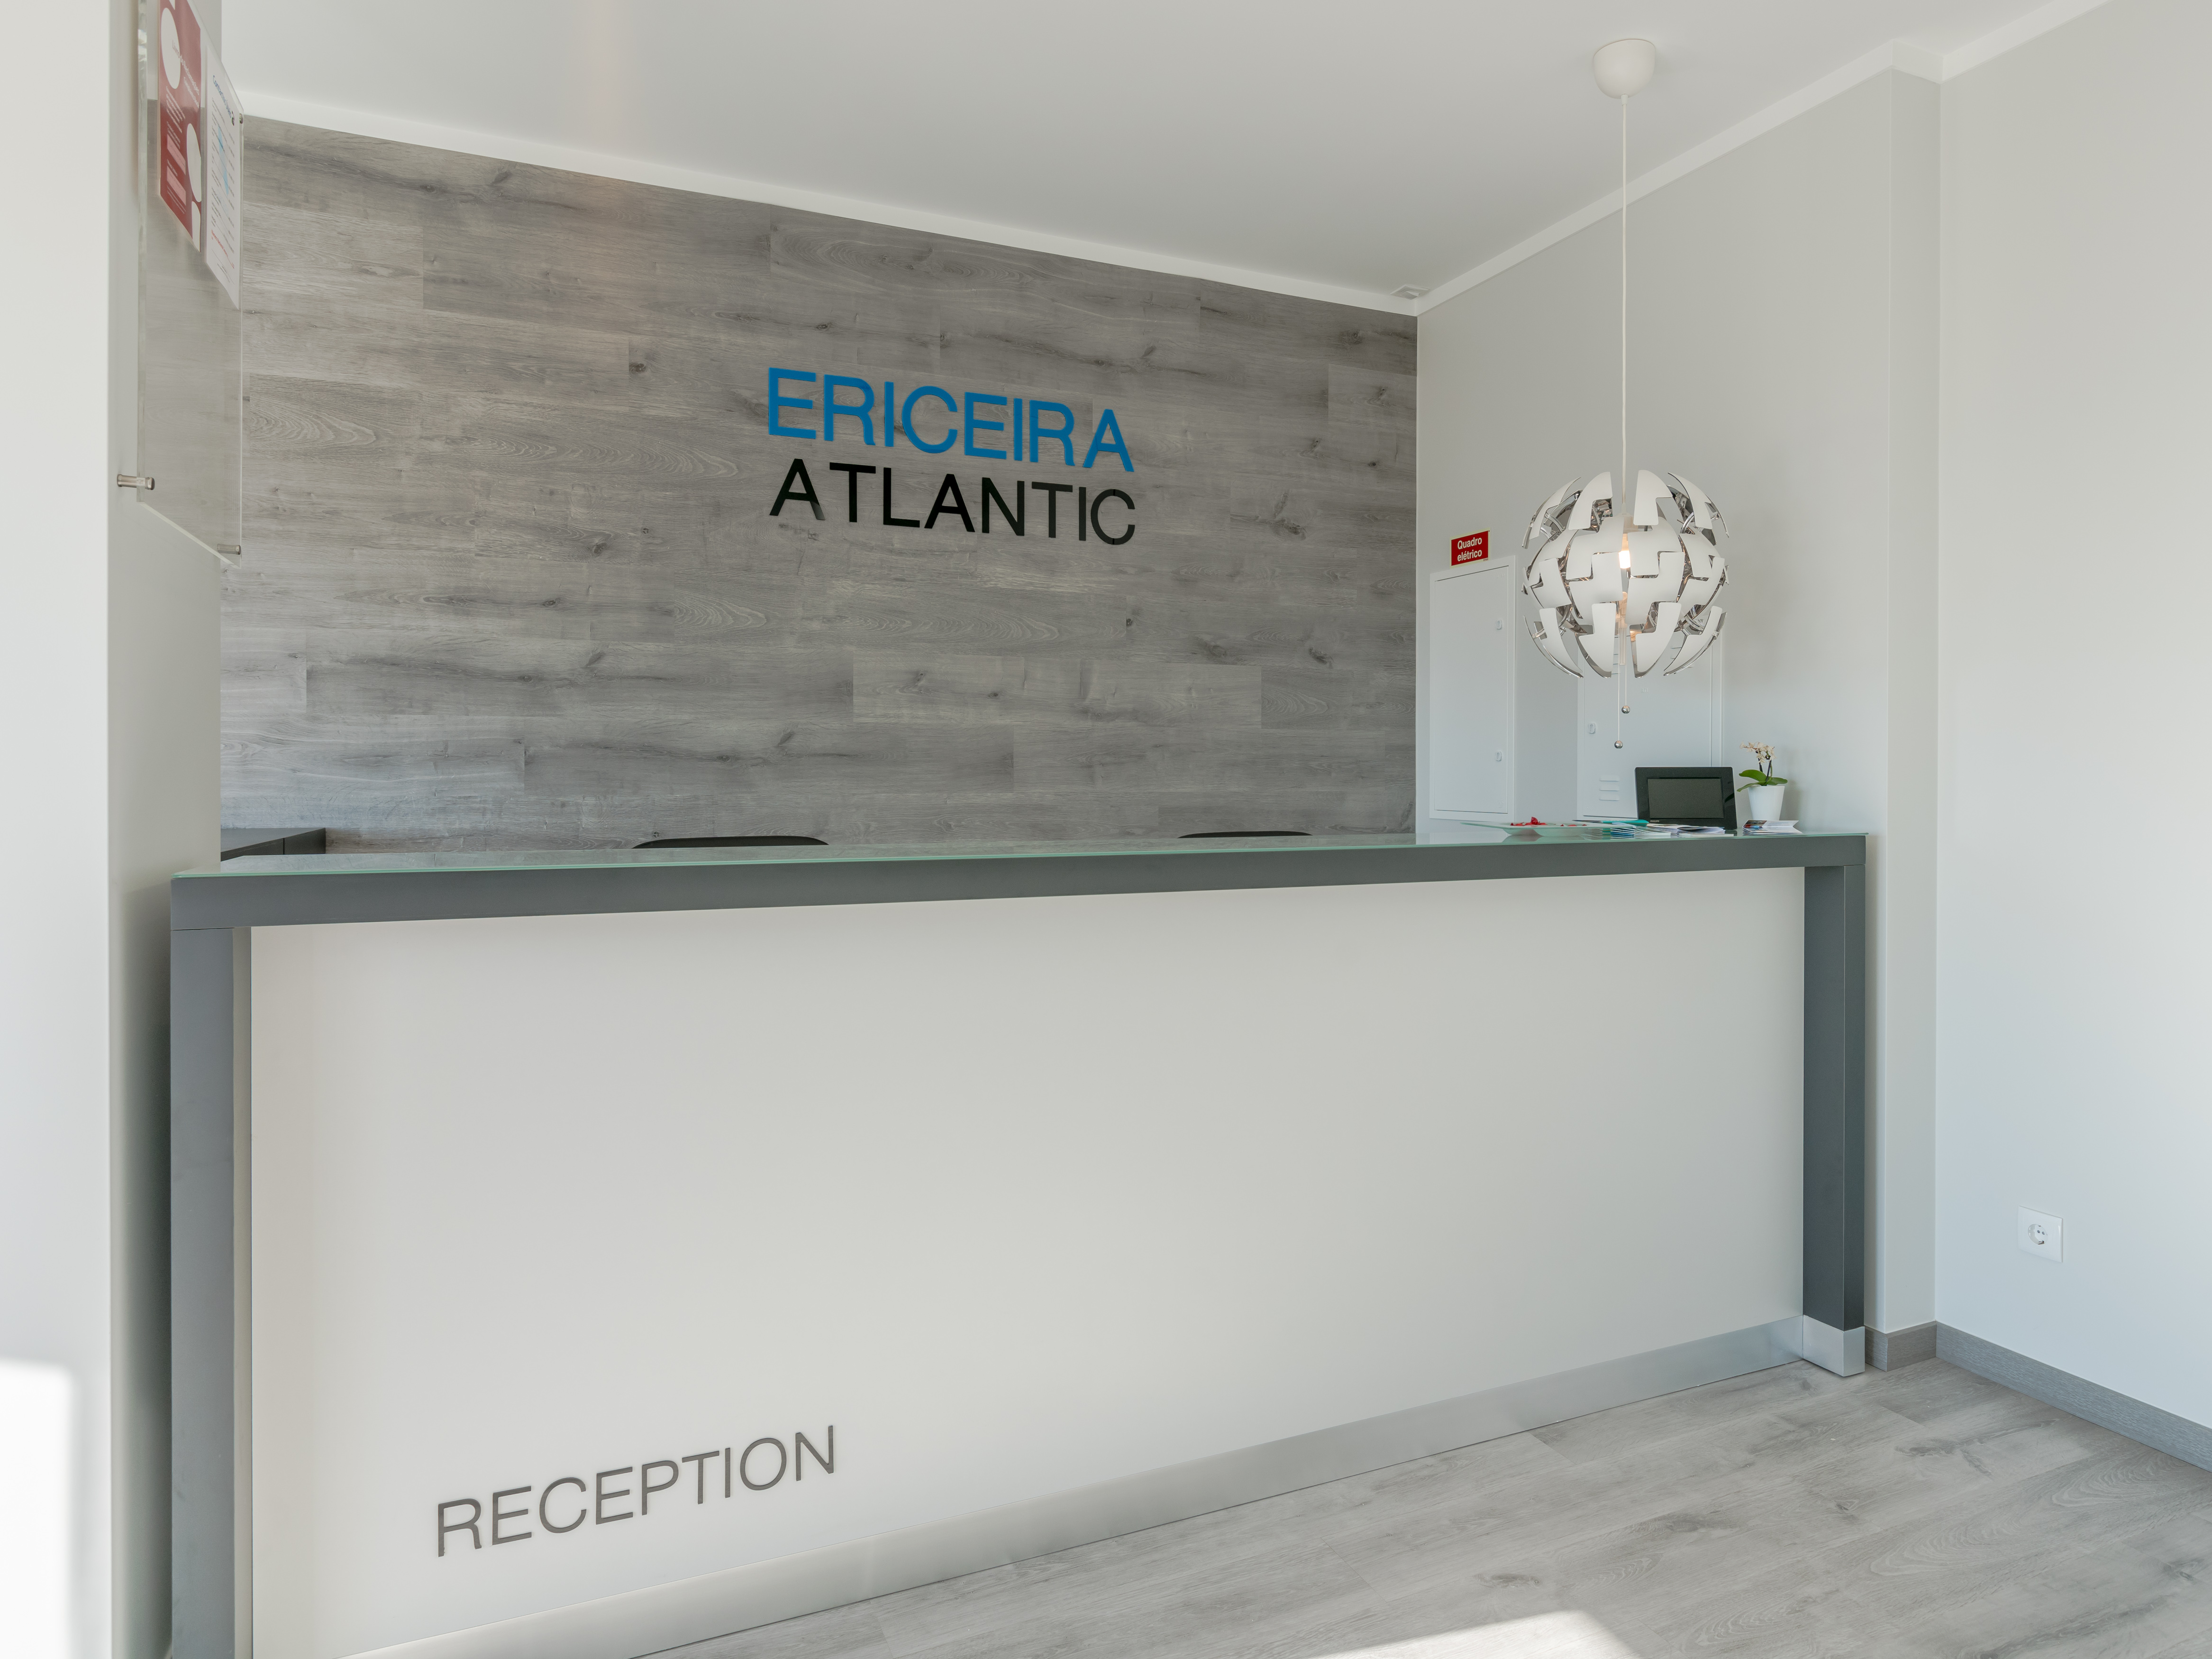 Ericeira Atlantic